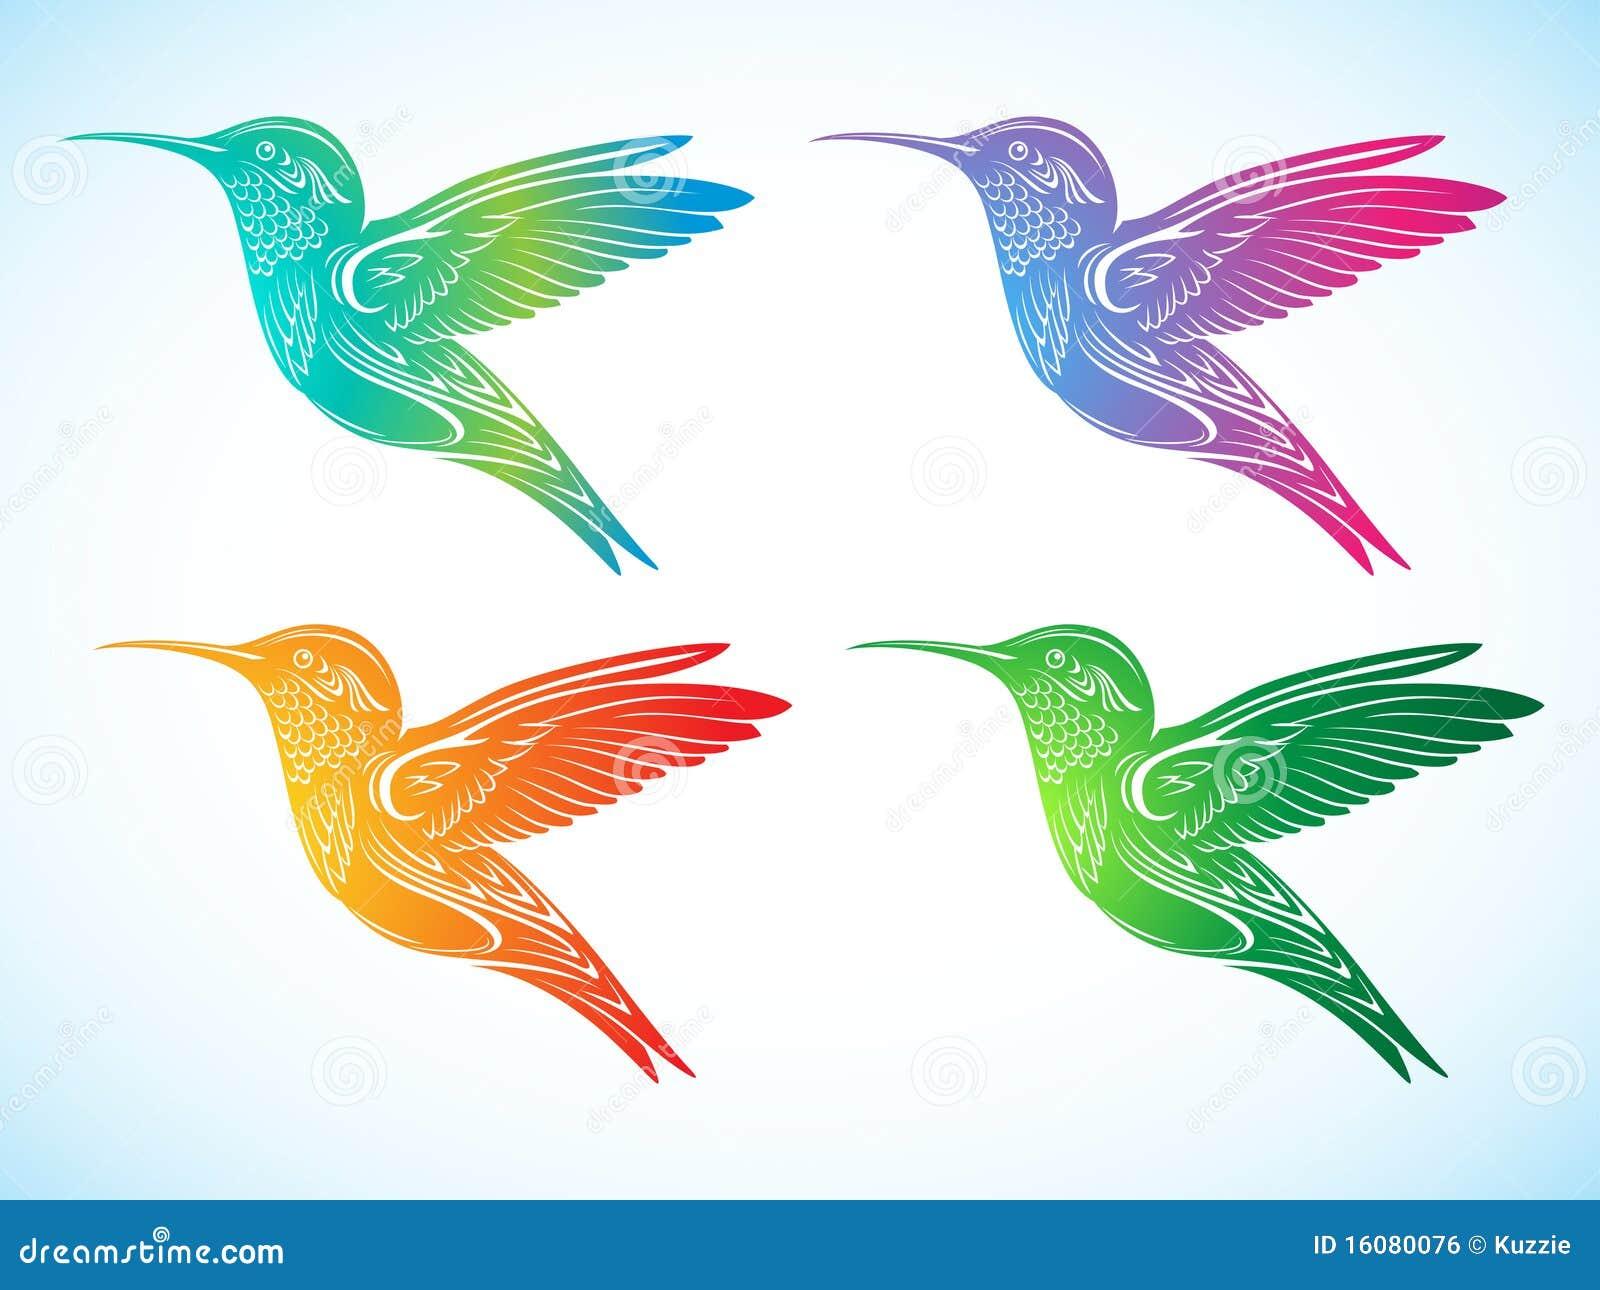 Hummingbird And Honeysuckle Tattoo Colorful hummingbirds